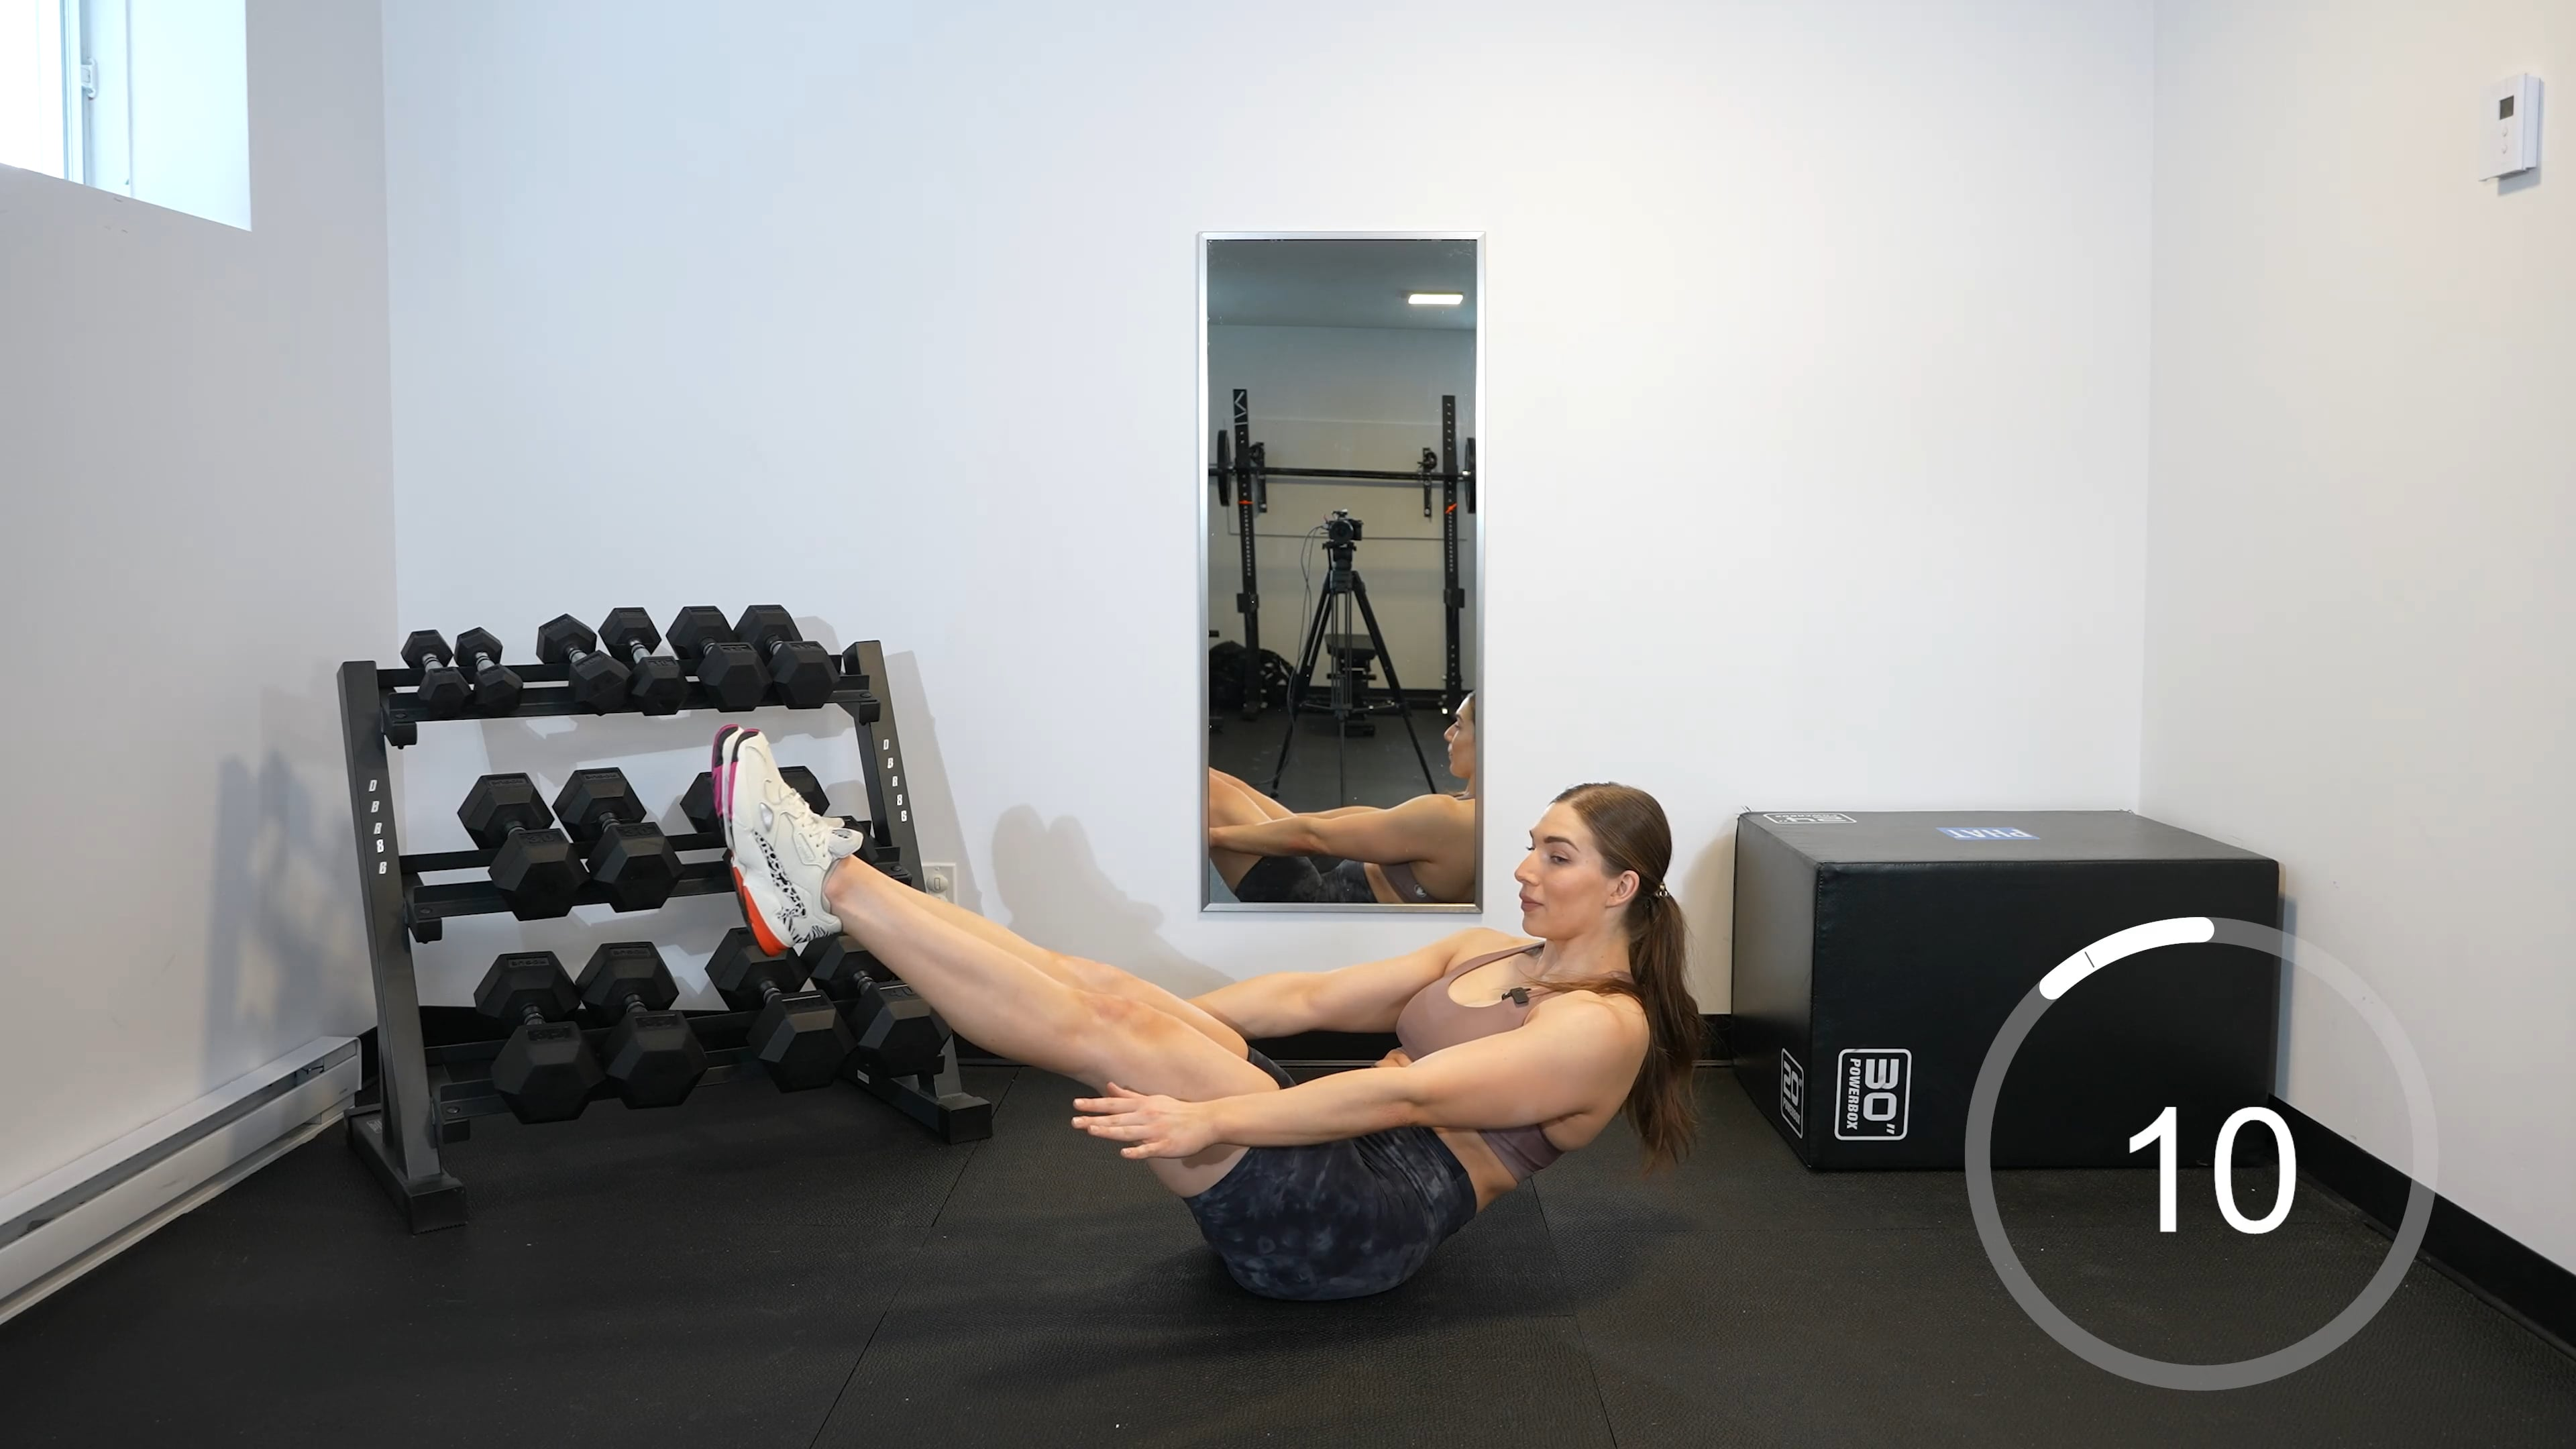 HIIT Full-Body 45 minutes sans équipement